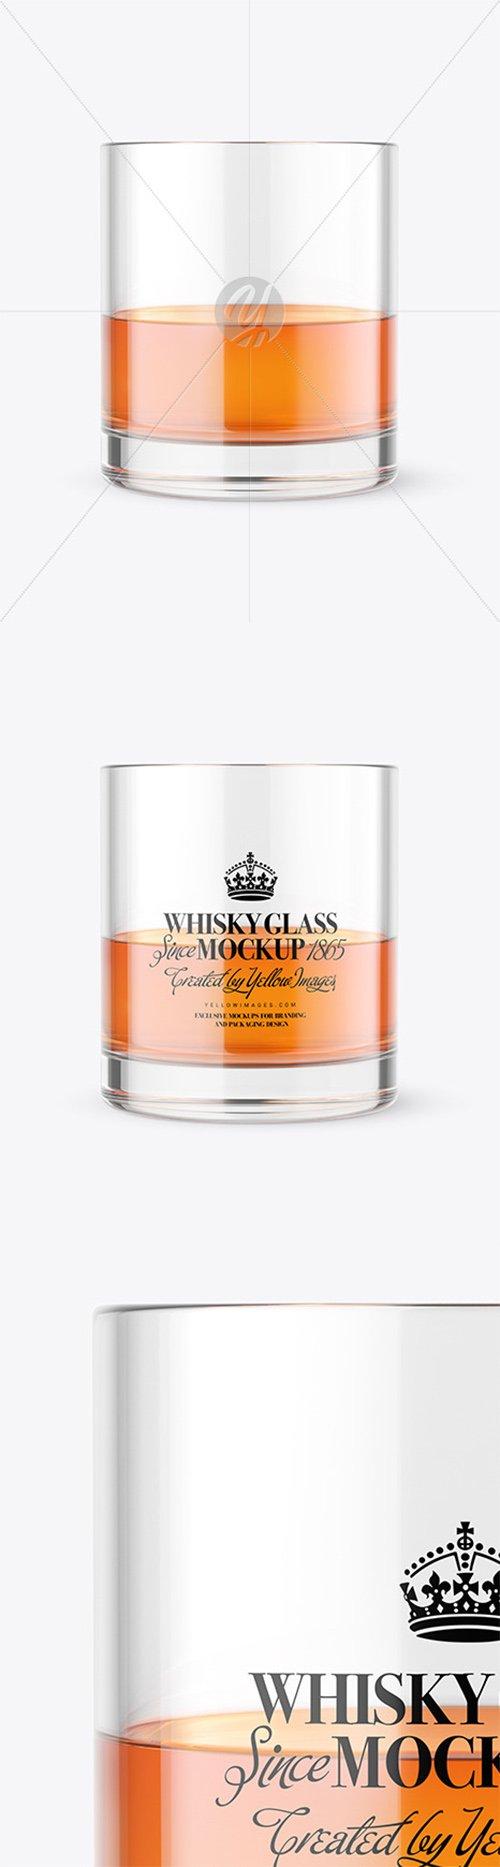 Whisky Glass Mockup 64937 TIF